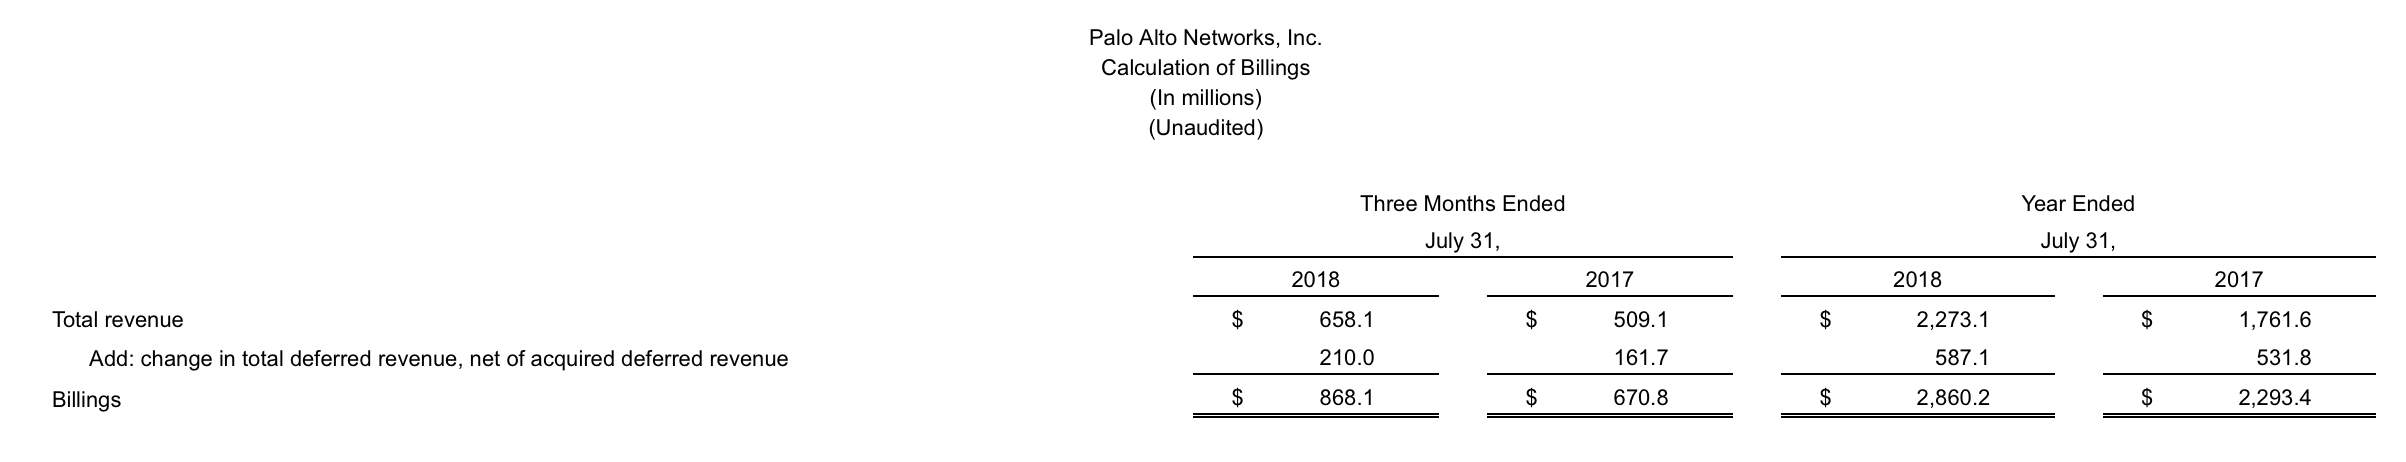 Palo Alto Networks The Path Ahead Looks Rosy Palo Alto Networks